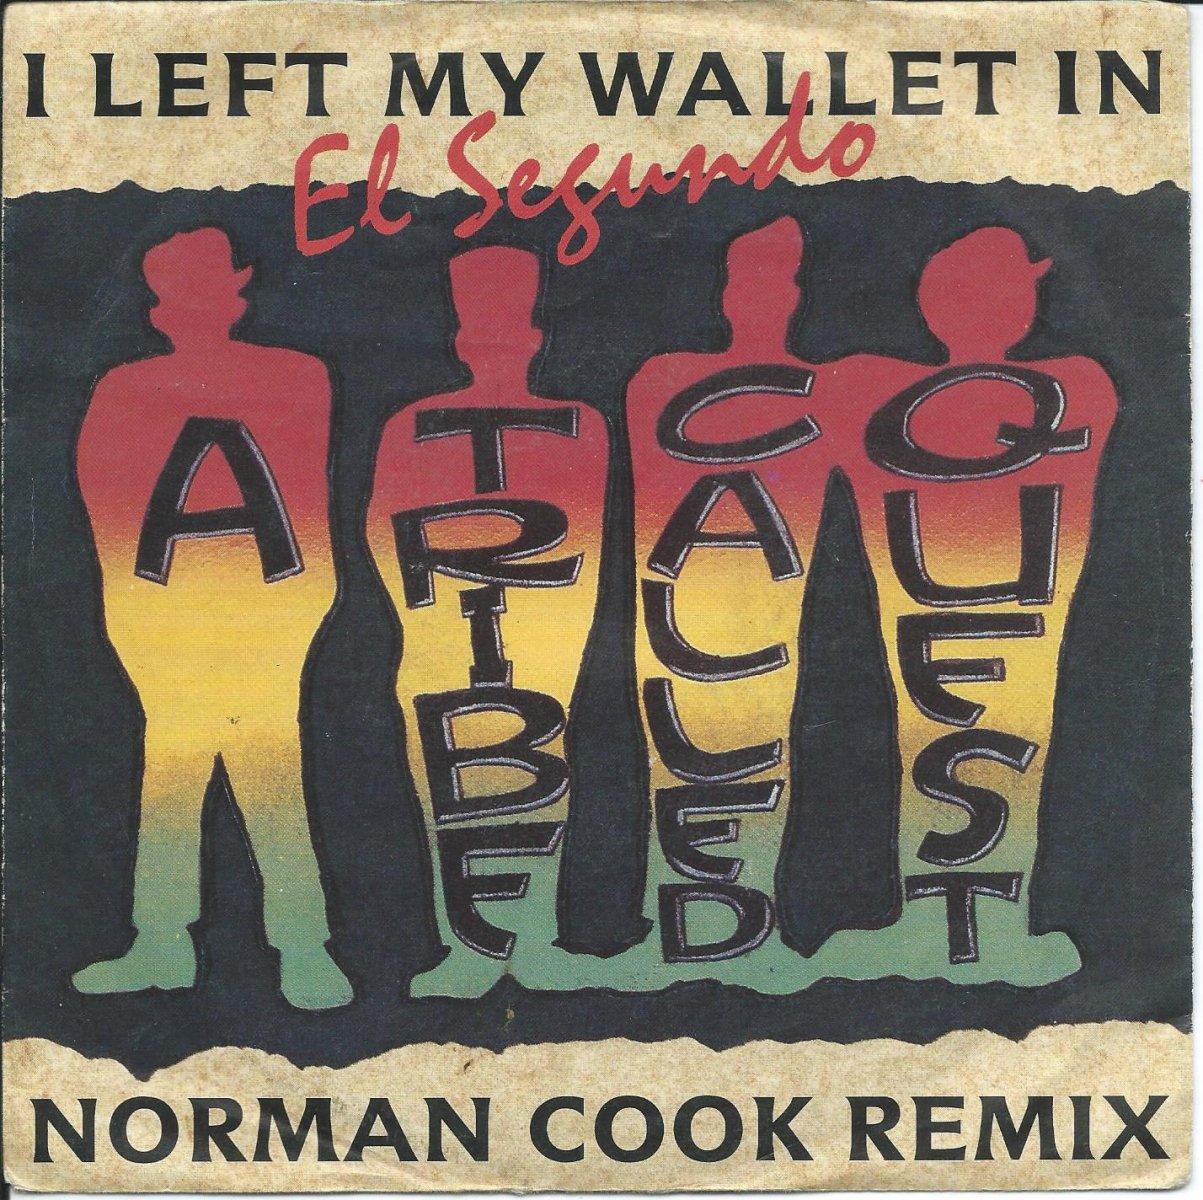 A TRIBE CALLED QUEST / I LEFT MY WALLET IN EL SEGUNDO (NORMAN COOK REMIX) (7